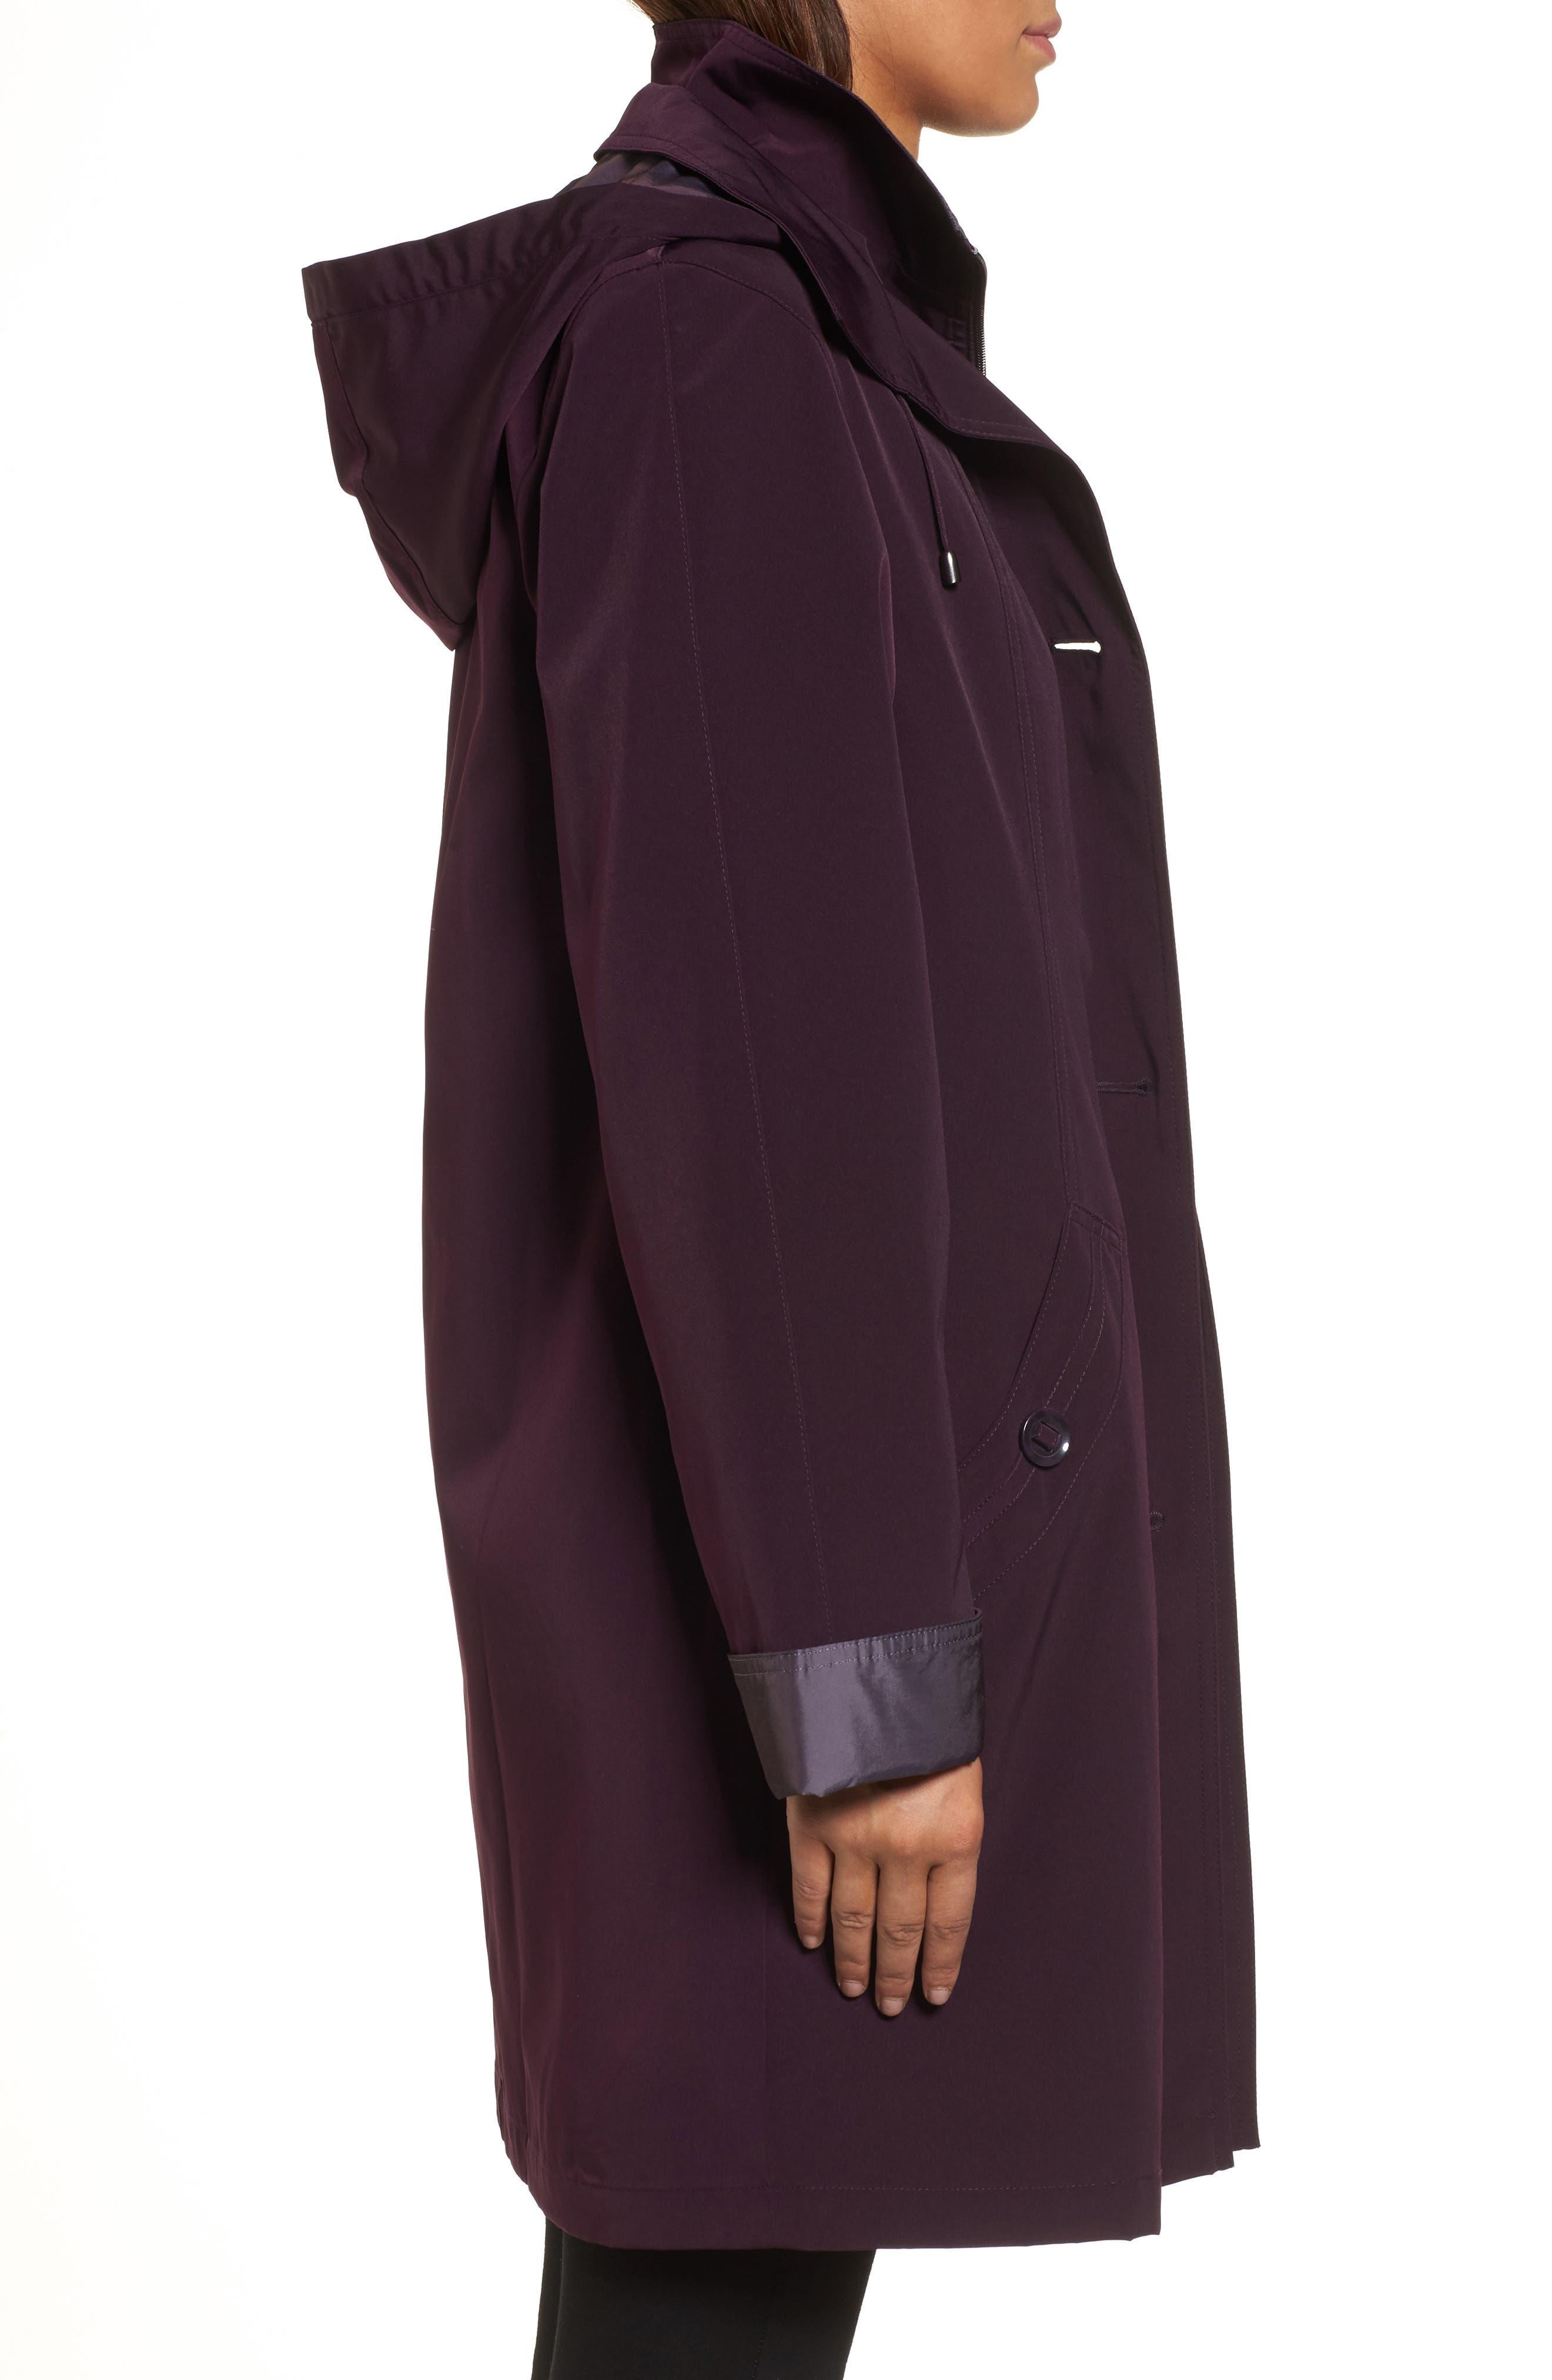 A-Line Raincoat with Detachable Hood & Liner,                             Alternate thumbnail 3, color,                             Blackberry